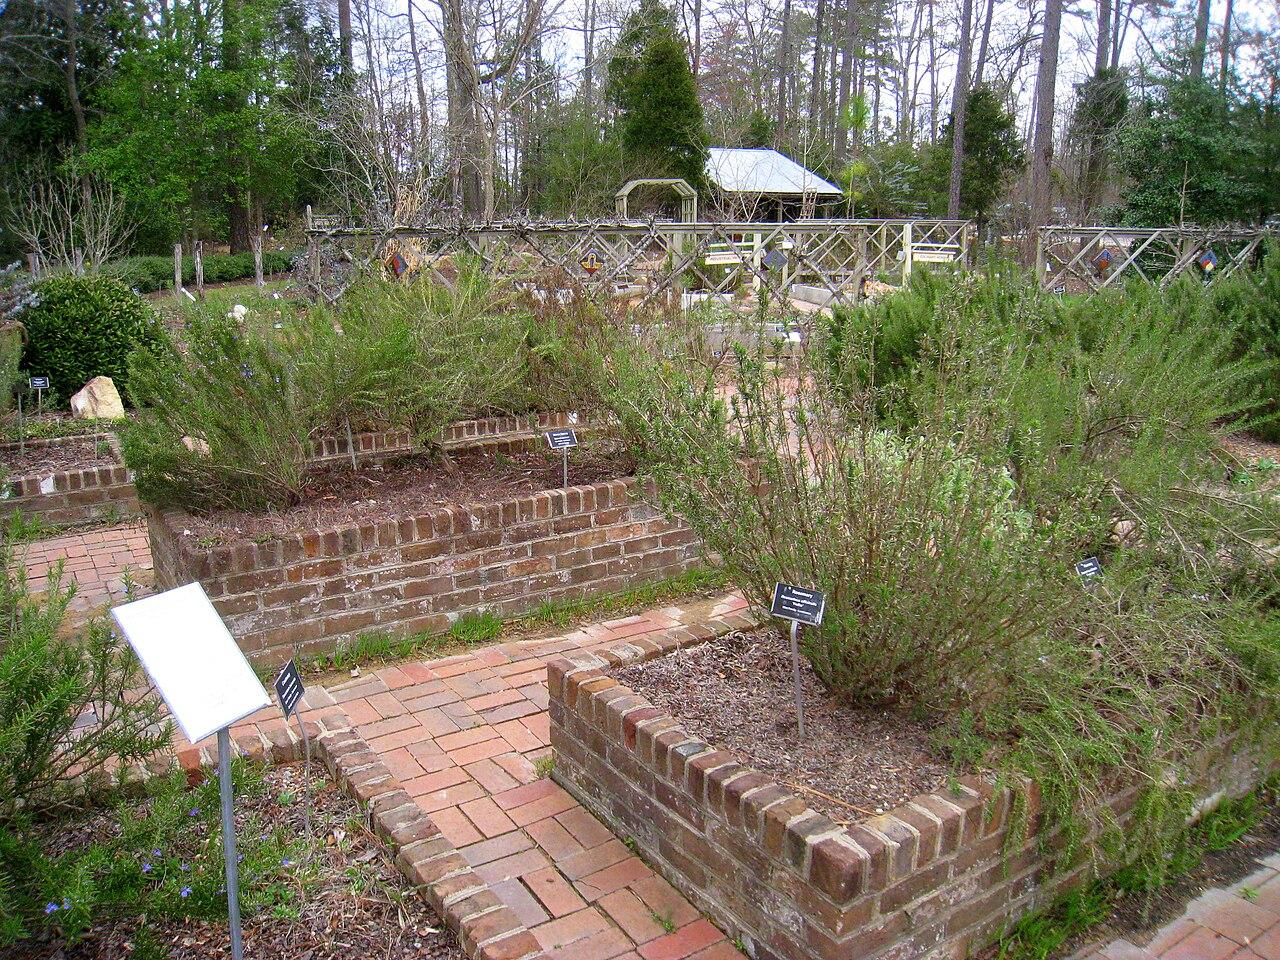 File North Carolina Botanical Garden March 15 2010 Img 4948 Jpg Wikimedia Commons